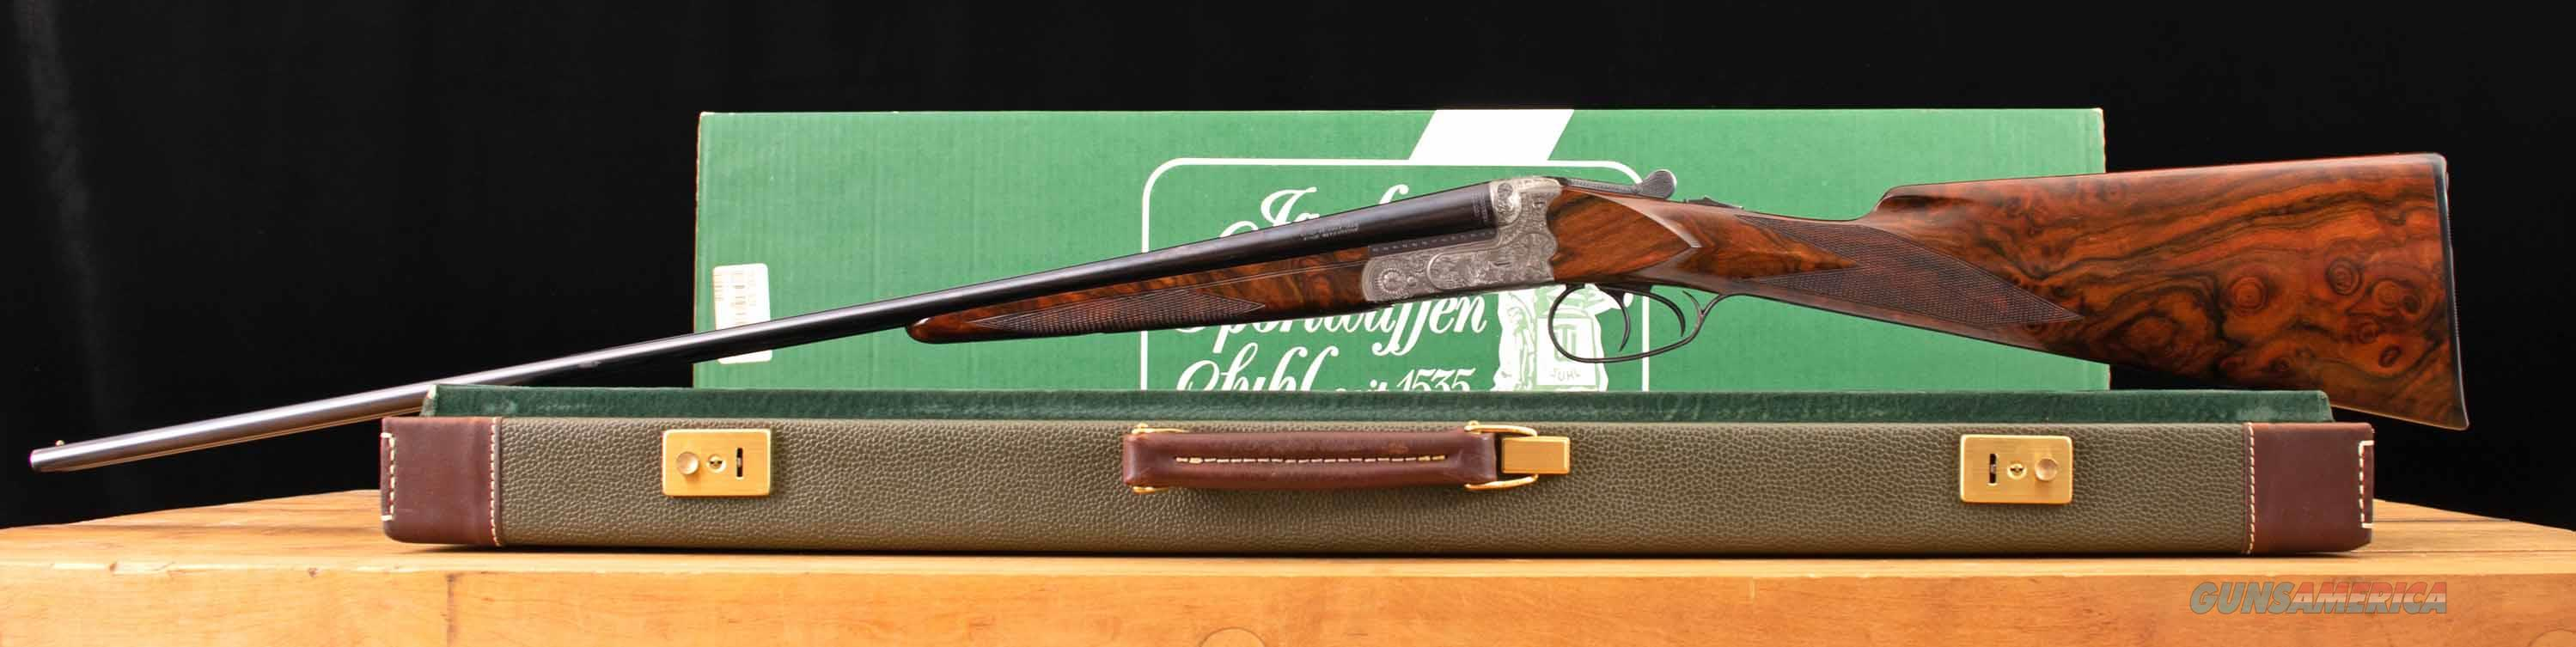 Merkel 360 EL .410 – AWESOME WOOD, CASED, 99%, vintage firearms inc   Guns > Shotguns > Merkel Shotguns